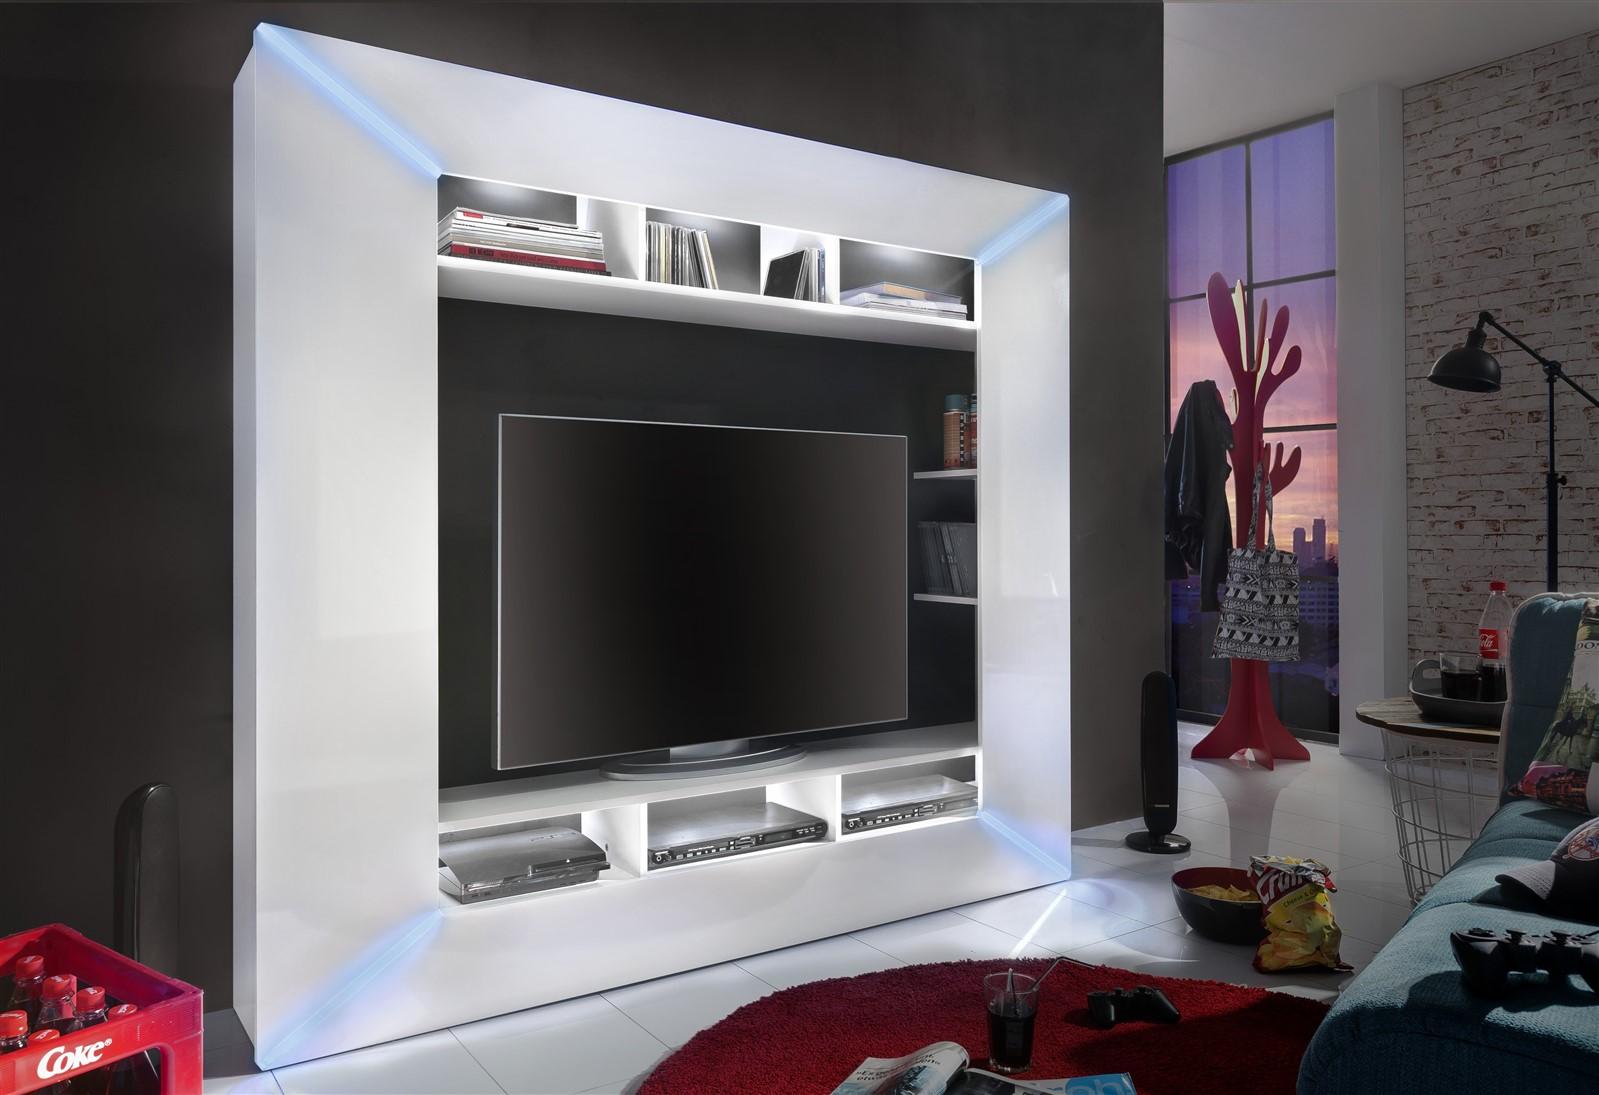 Mediawand Wohnwand   FINLEY   Hochglanz Weiss Inkl. LED Beleuchtung | EBay